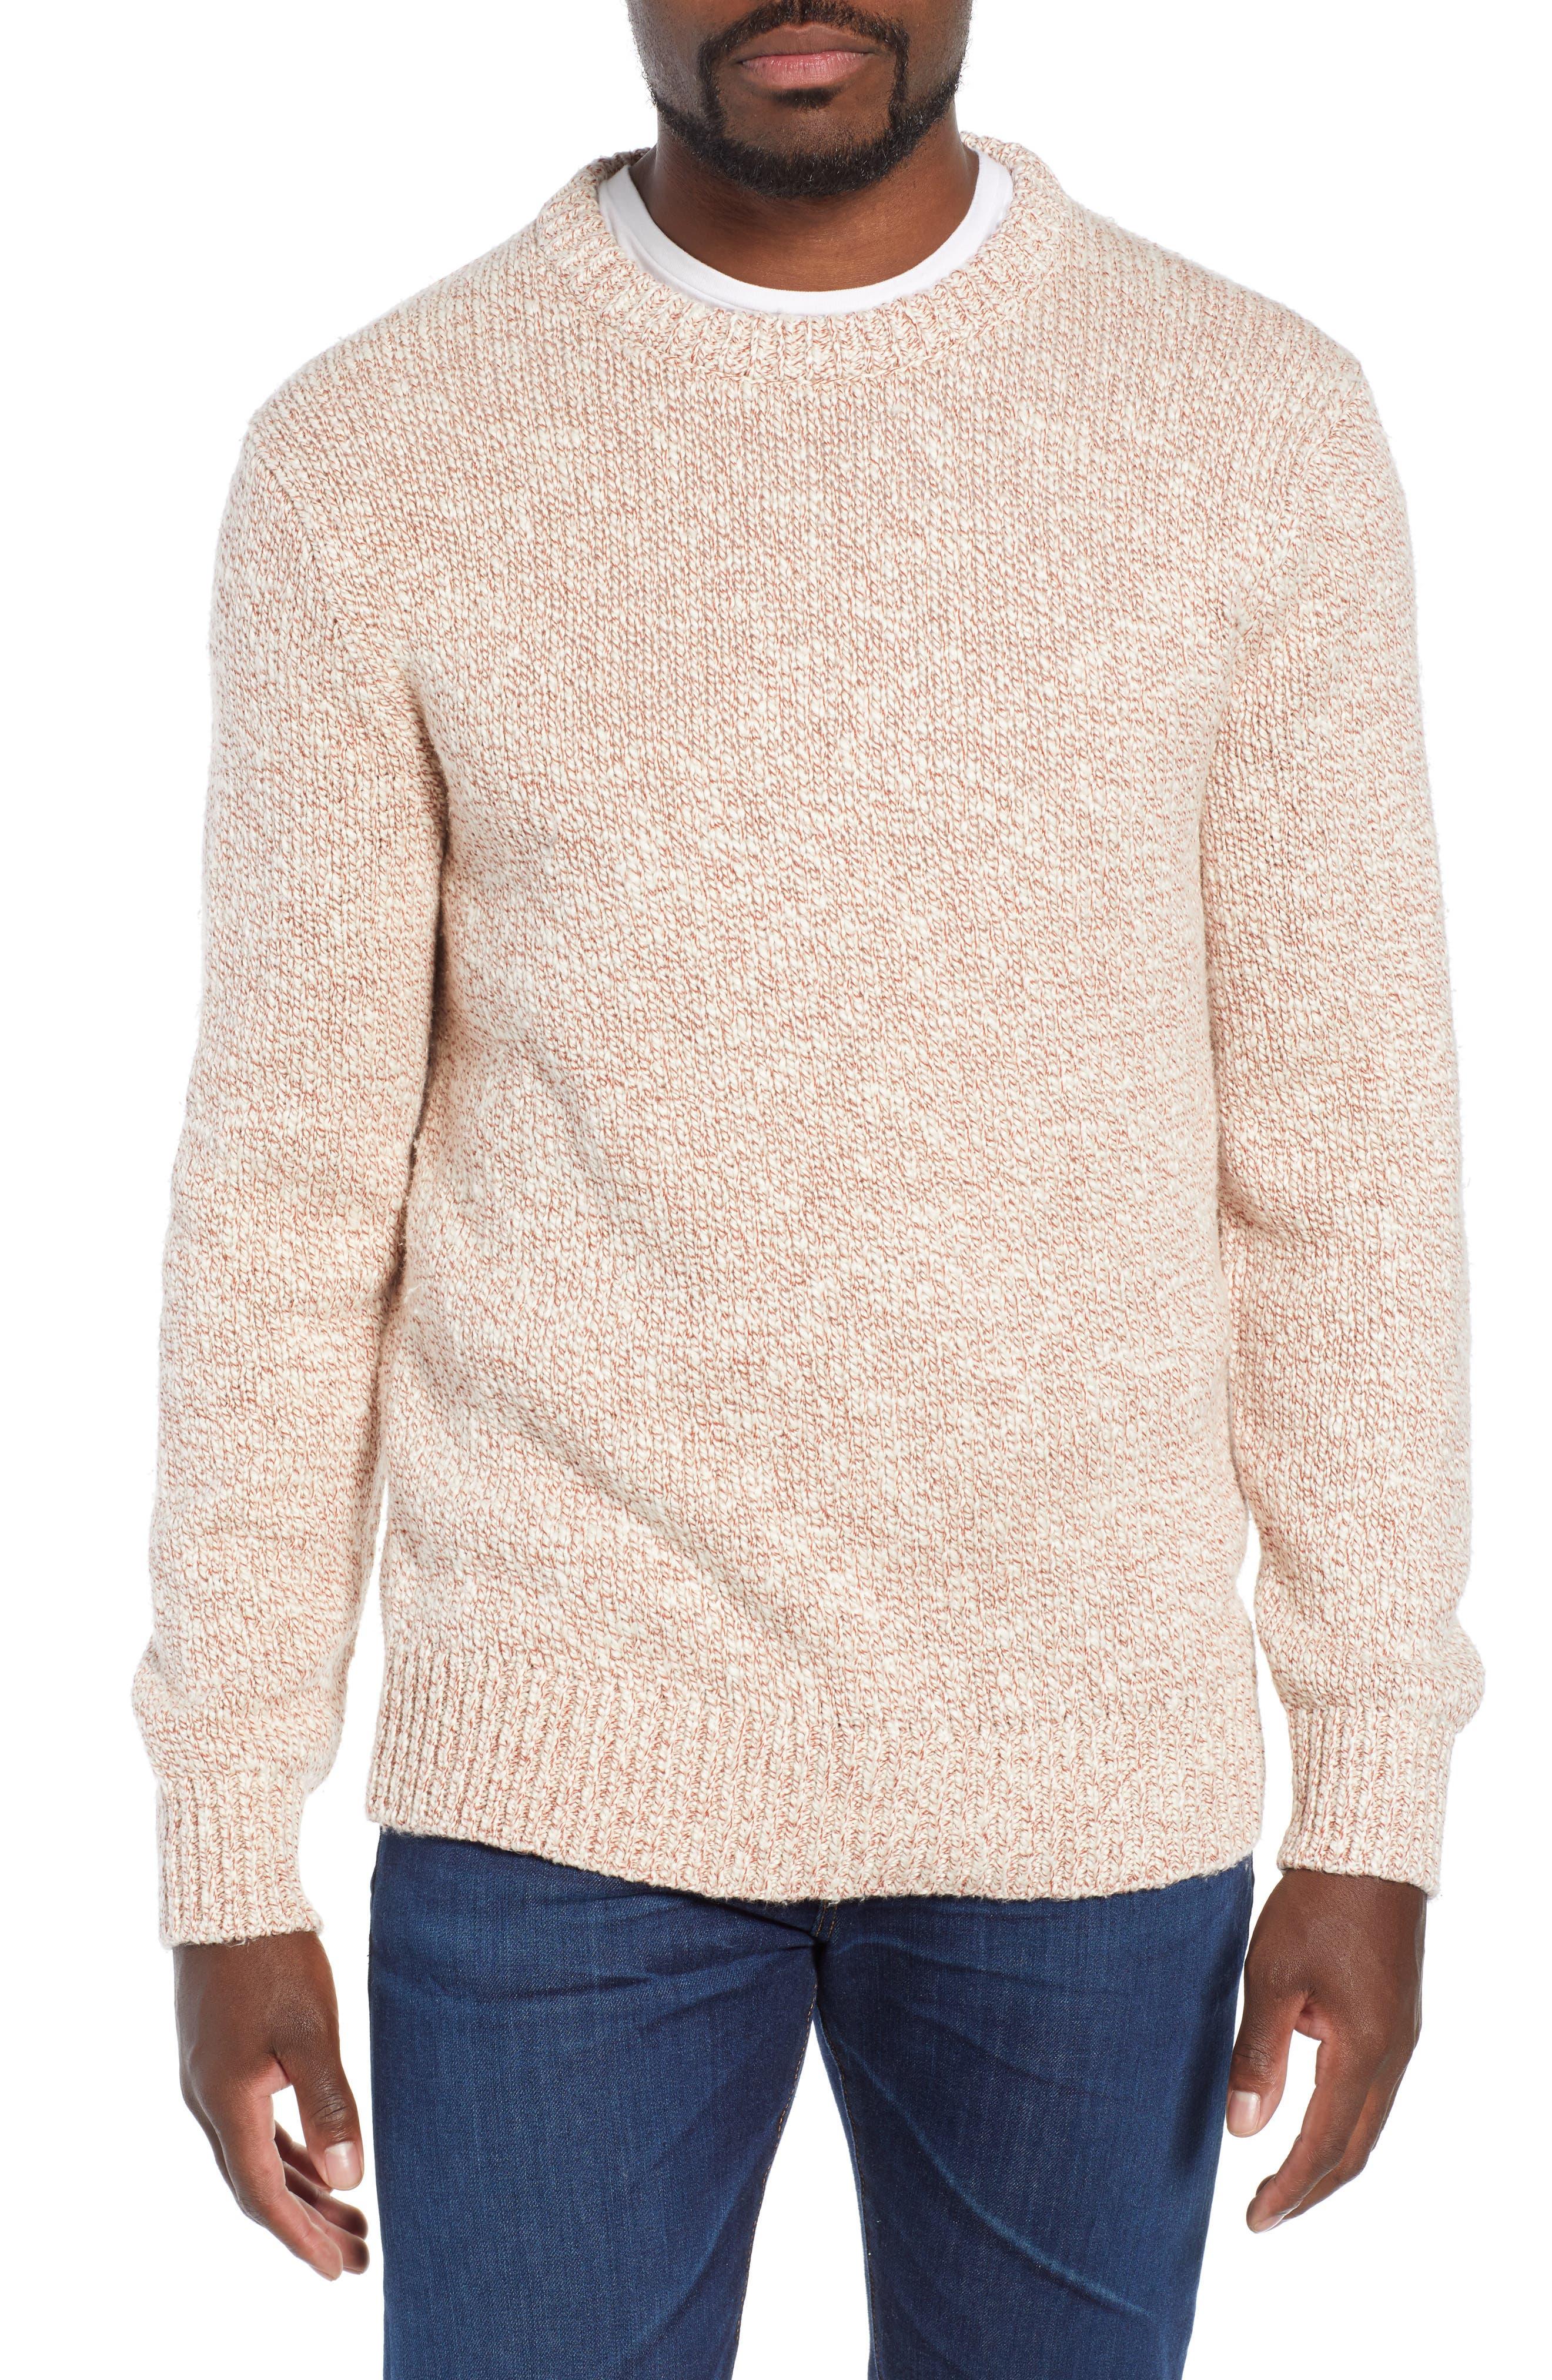 Wallace & Barnes Crewneck Marled Cotton Sweater,                             Main thumbnail 1, color,                             TERRACOTTA